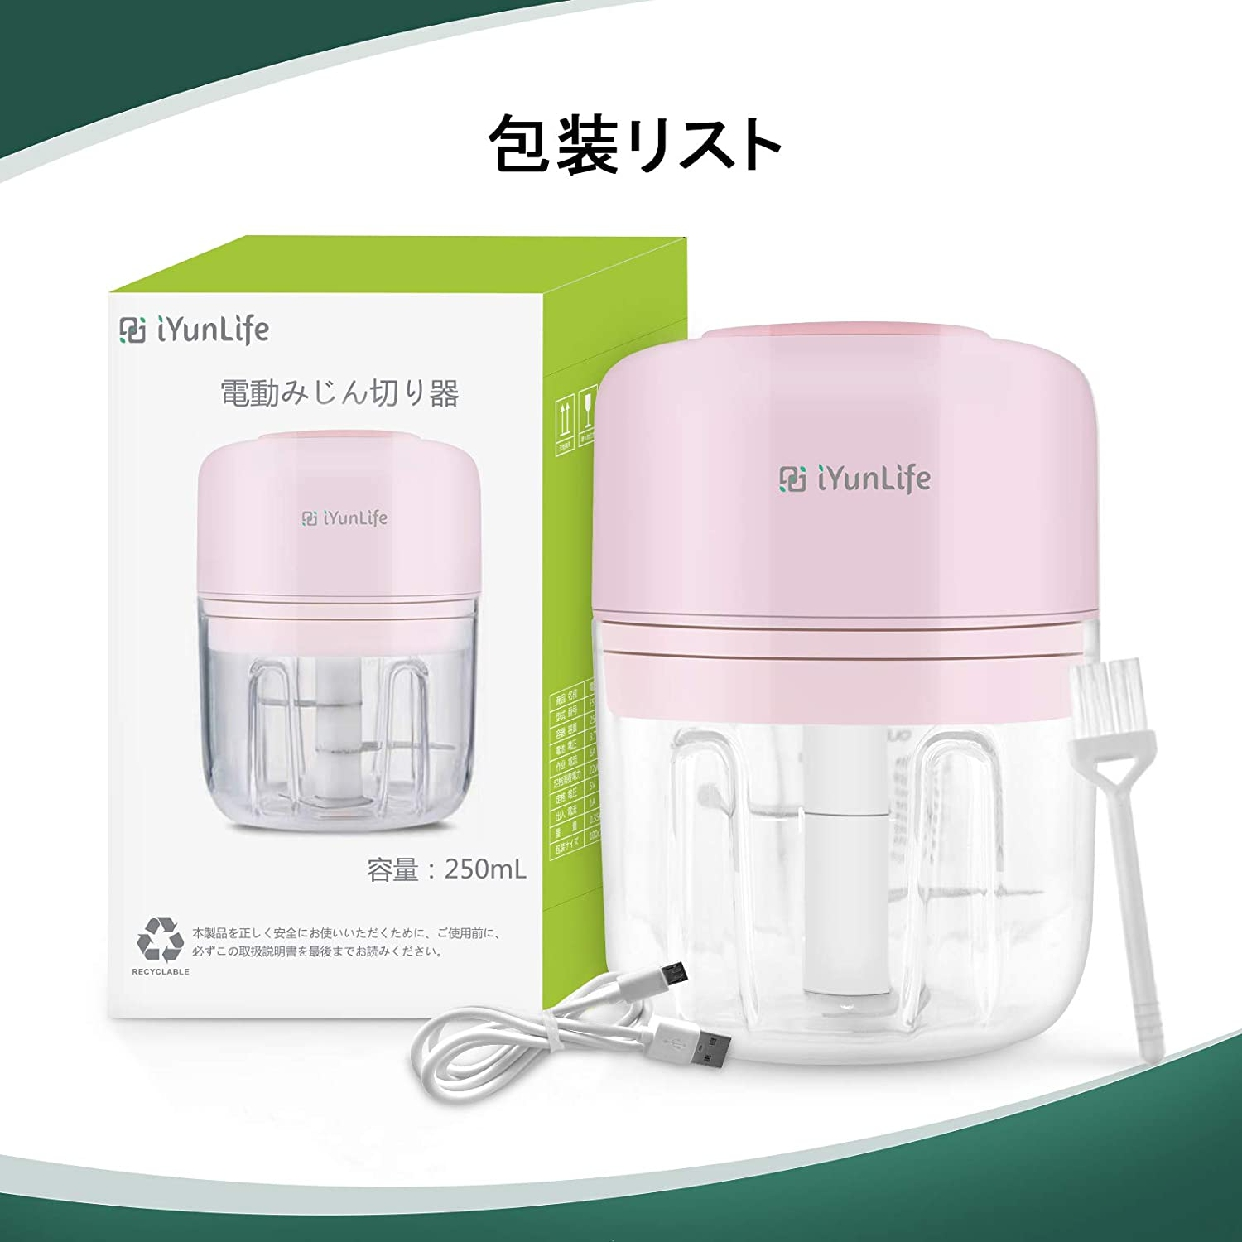 iYunLife(アイユンライフ)みじん切り器 USB充電式 掃除ブラシ付き 日本語取扱説明書付属 (ピンク)の商品画像7